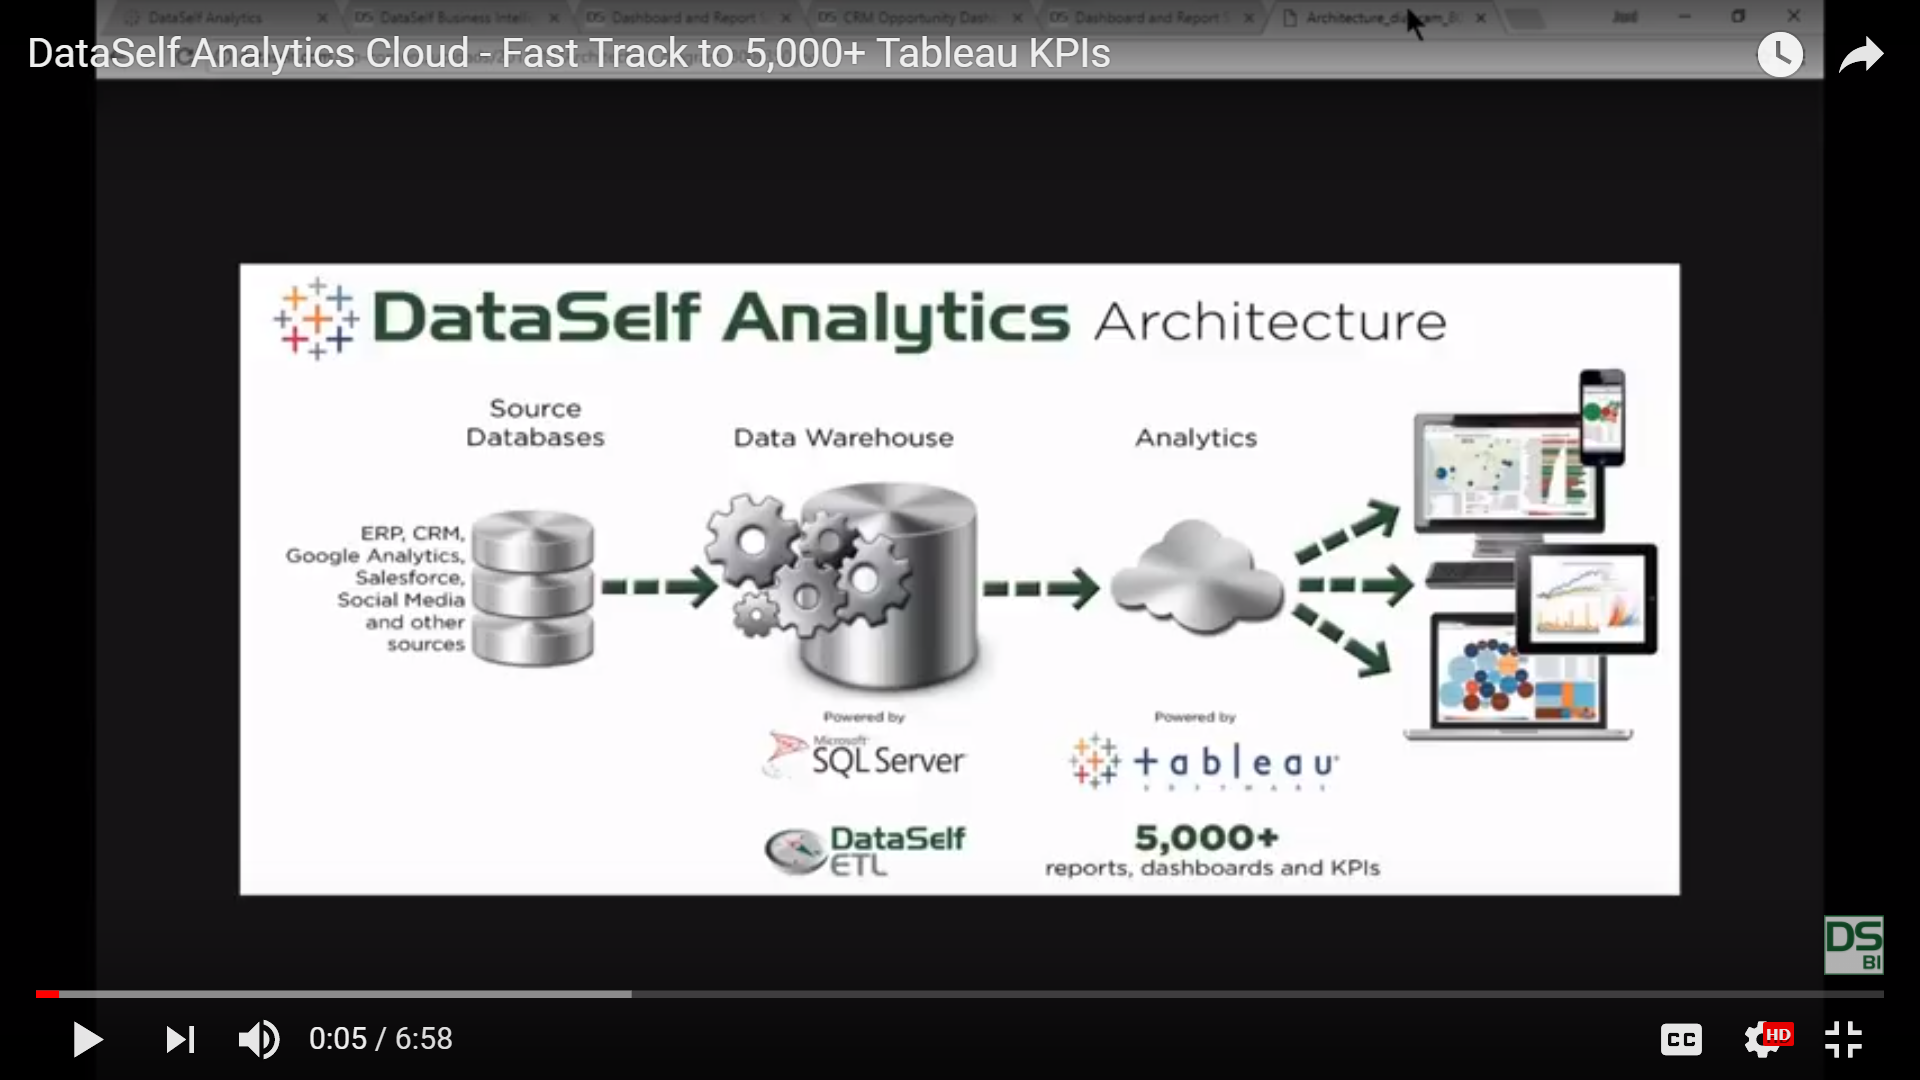 webinar image - Cloud Analytics.png